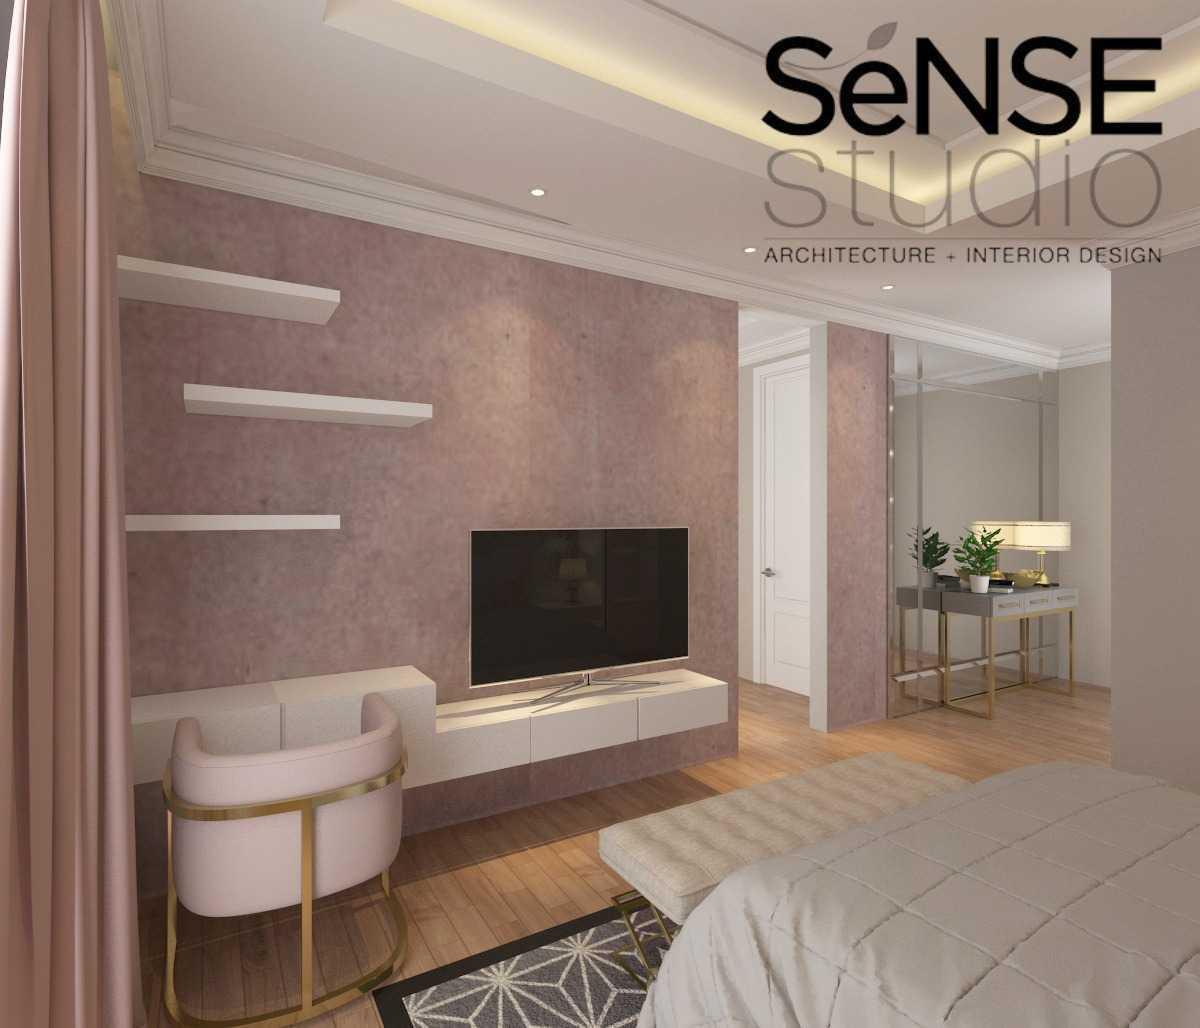 Sense Isle Studio Residence Surabaya Surabaya, Kota Sby, Jawa Timur, Indonesia Surabaya, Kota Sby, Jawa Timur, Indonesia Sense-Studio-Residence-Surabaya  80442